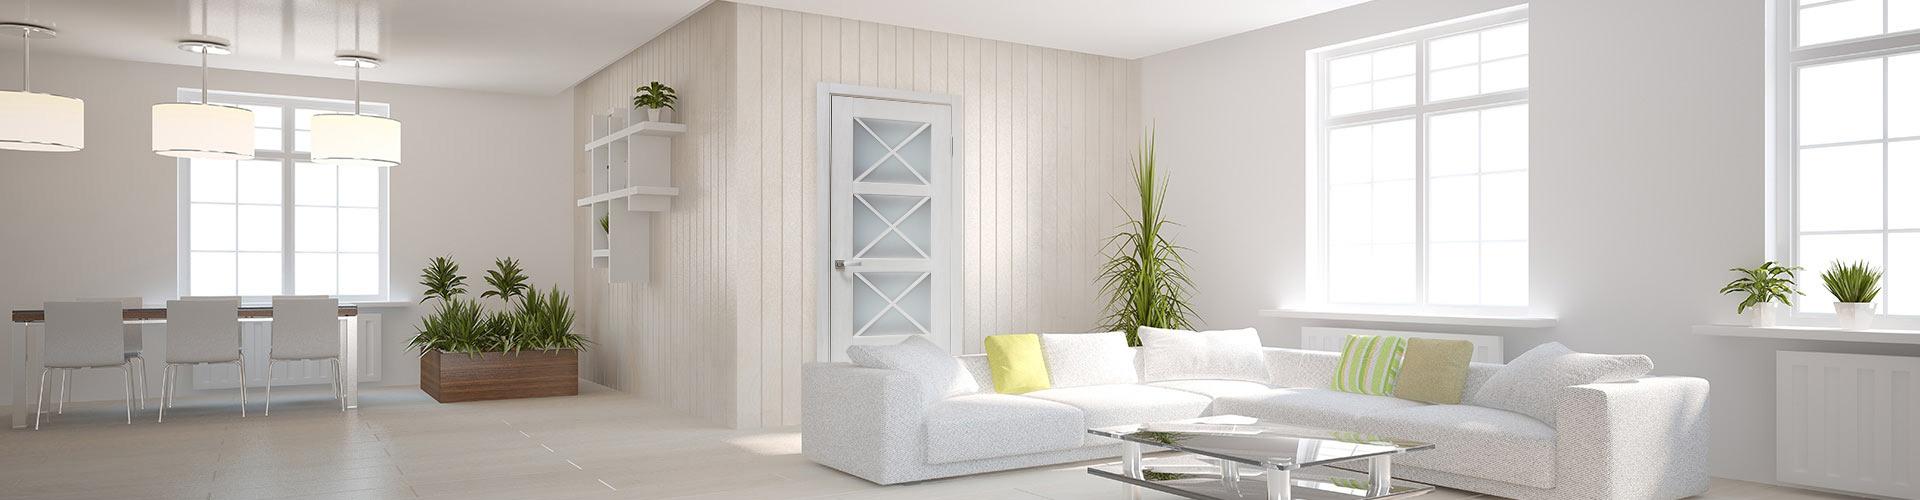 двери в интерьере (Классик)